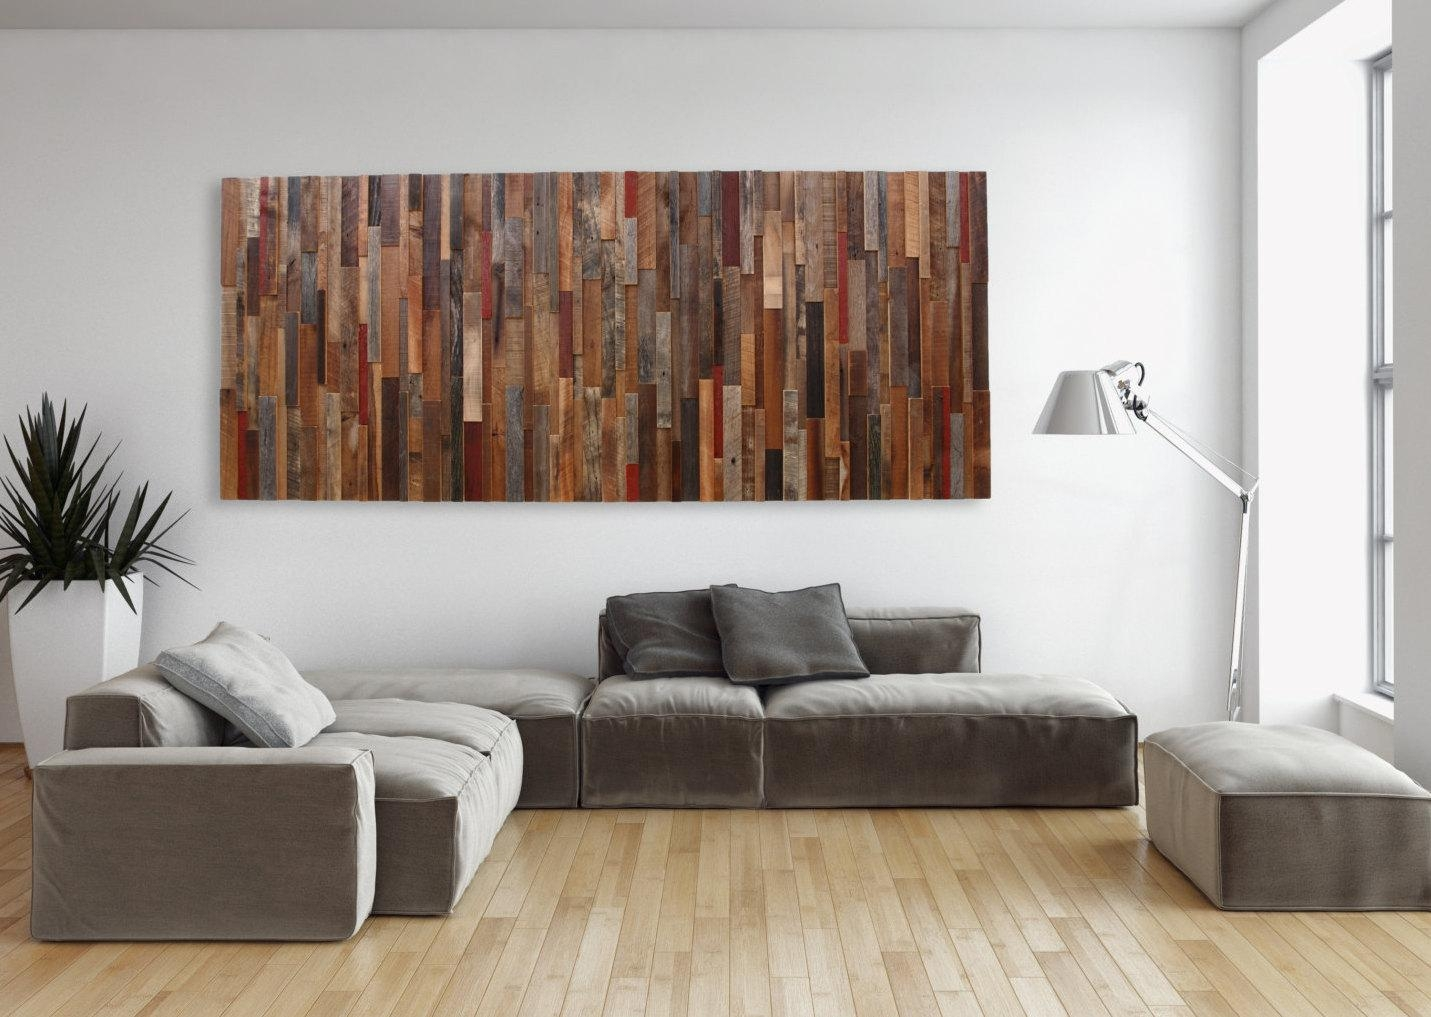 Big Wall Art Decor Design Ideas Modern Photo And Big Wall Art Regarding Big Wall Art (View 19 of 20)